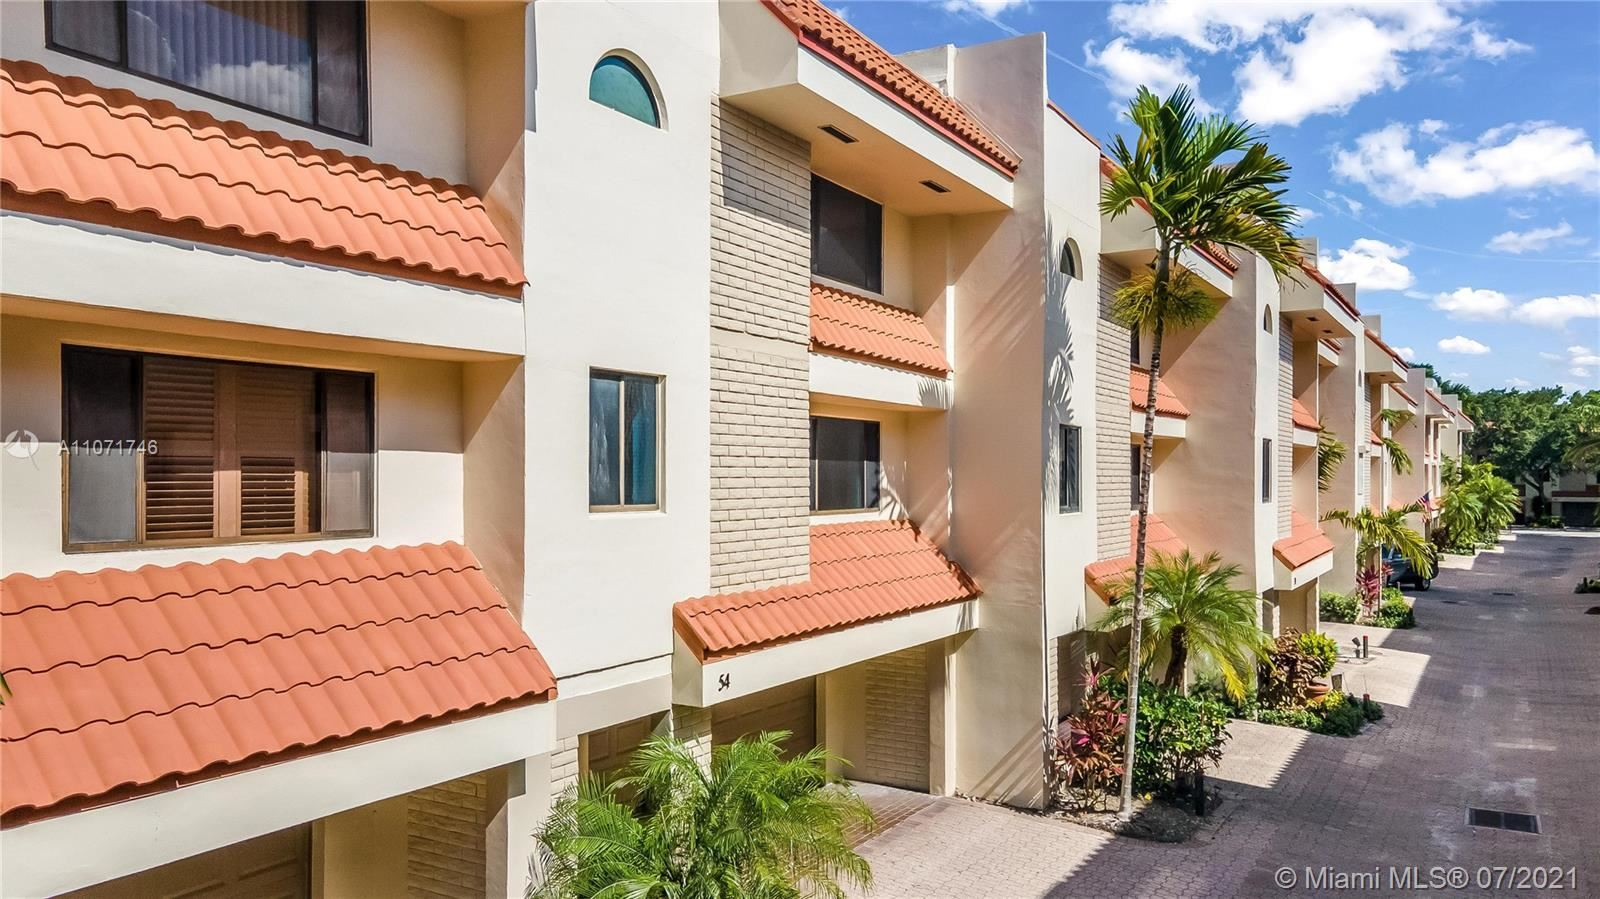 Photo of 1401 NE 9th Street #54, Fort Lauderdale, FL 33304 (MLS # A11071746)